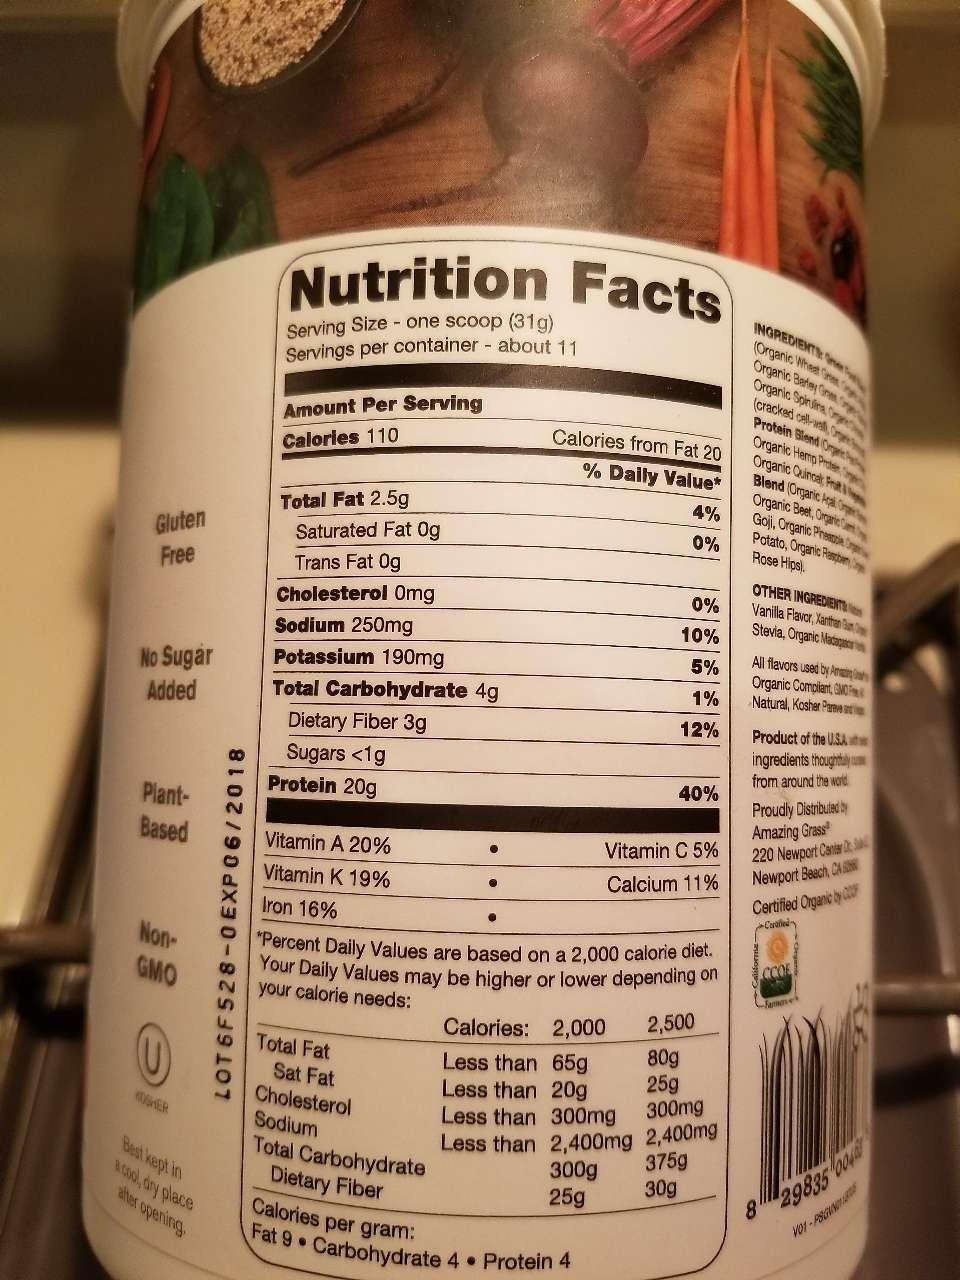 Amazing Grass Protein Superfood Pure Vanilla Calories